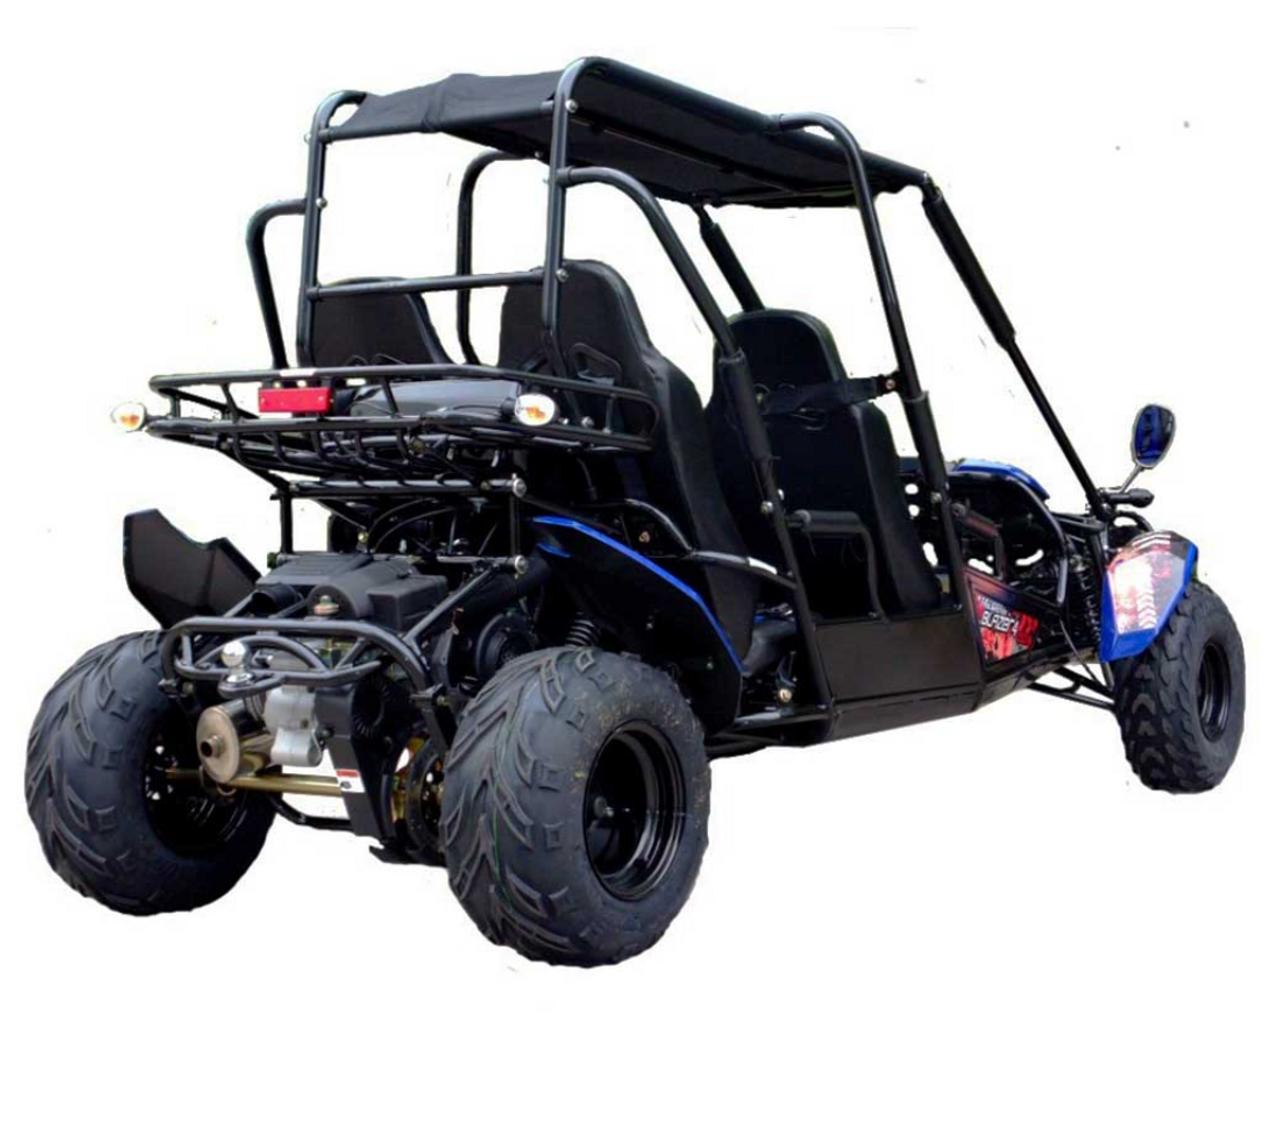 TrailMaster Blazer4 150X Go Kart - Rear View